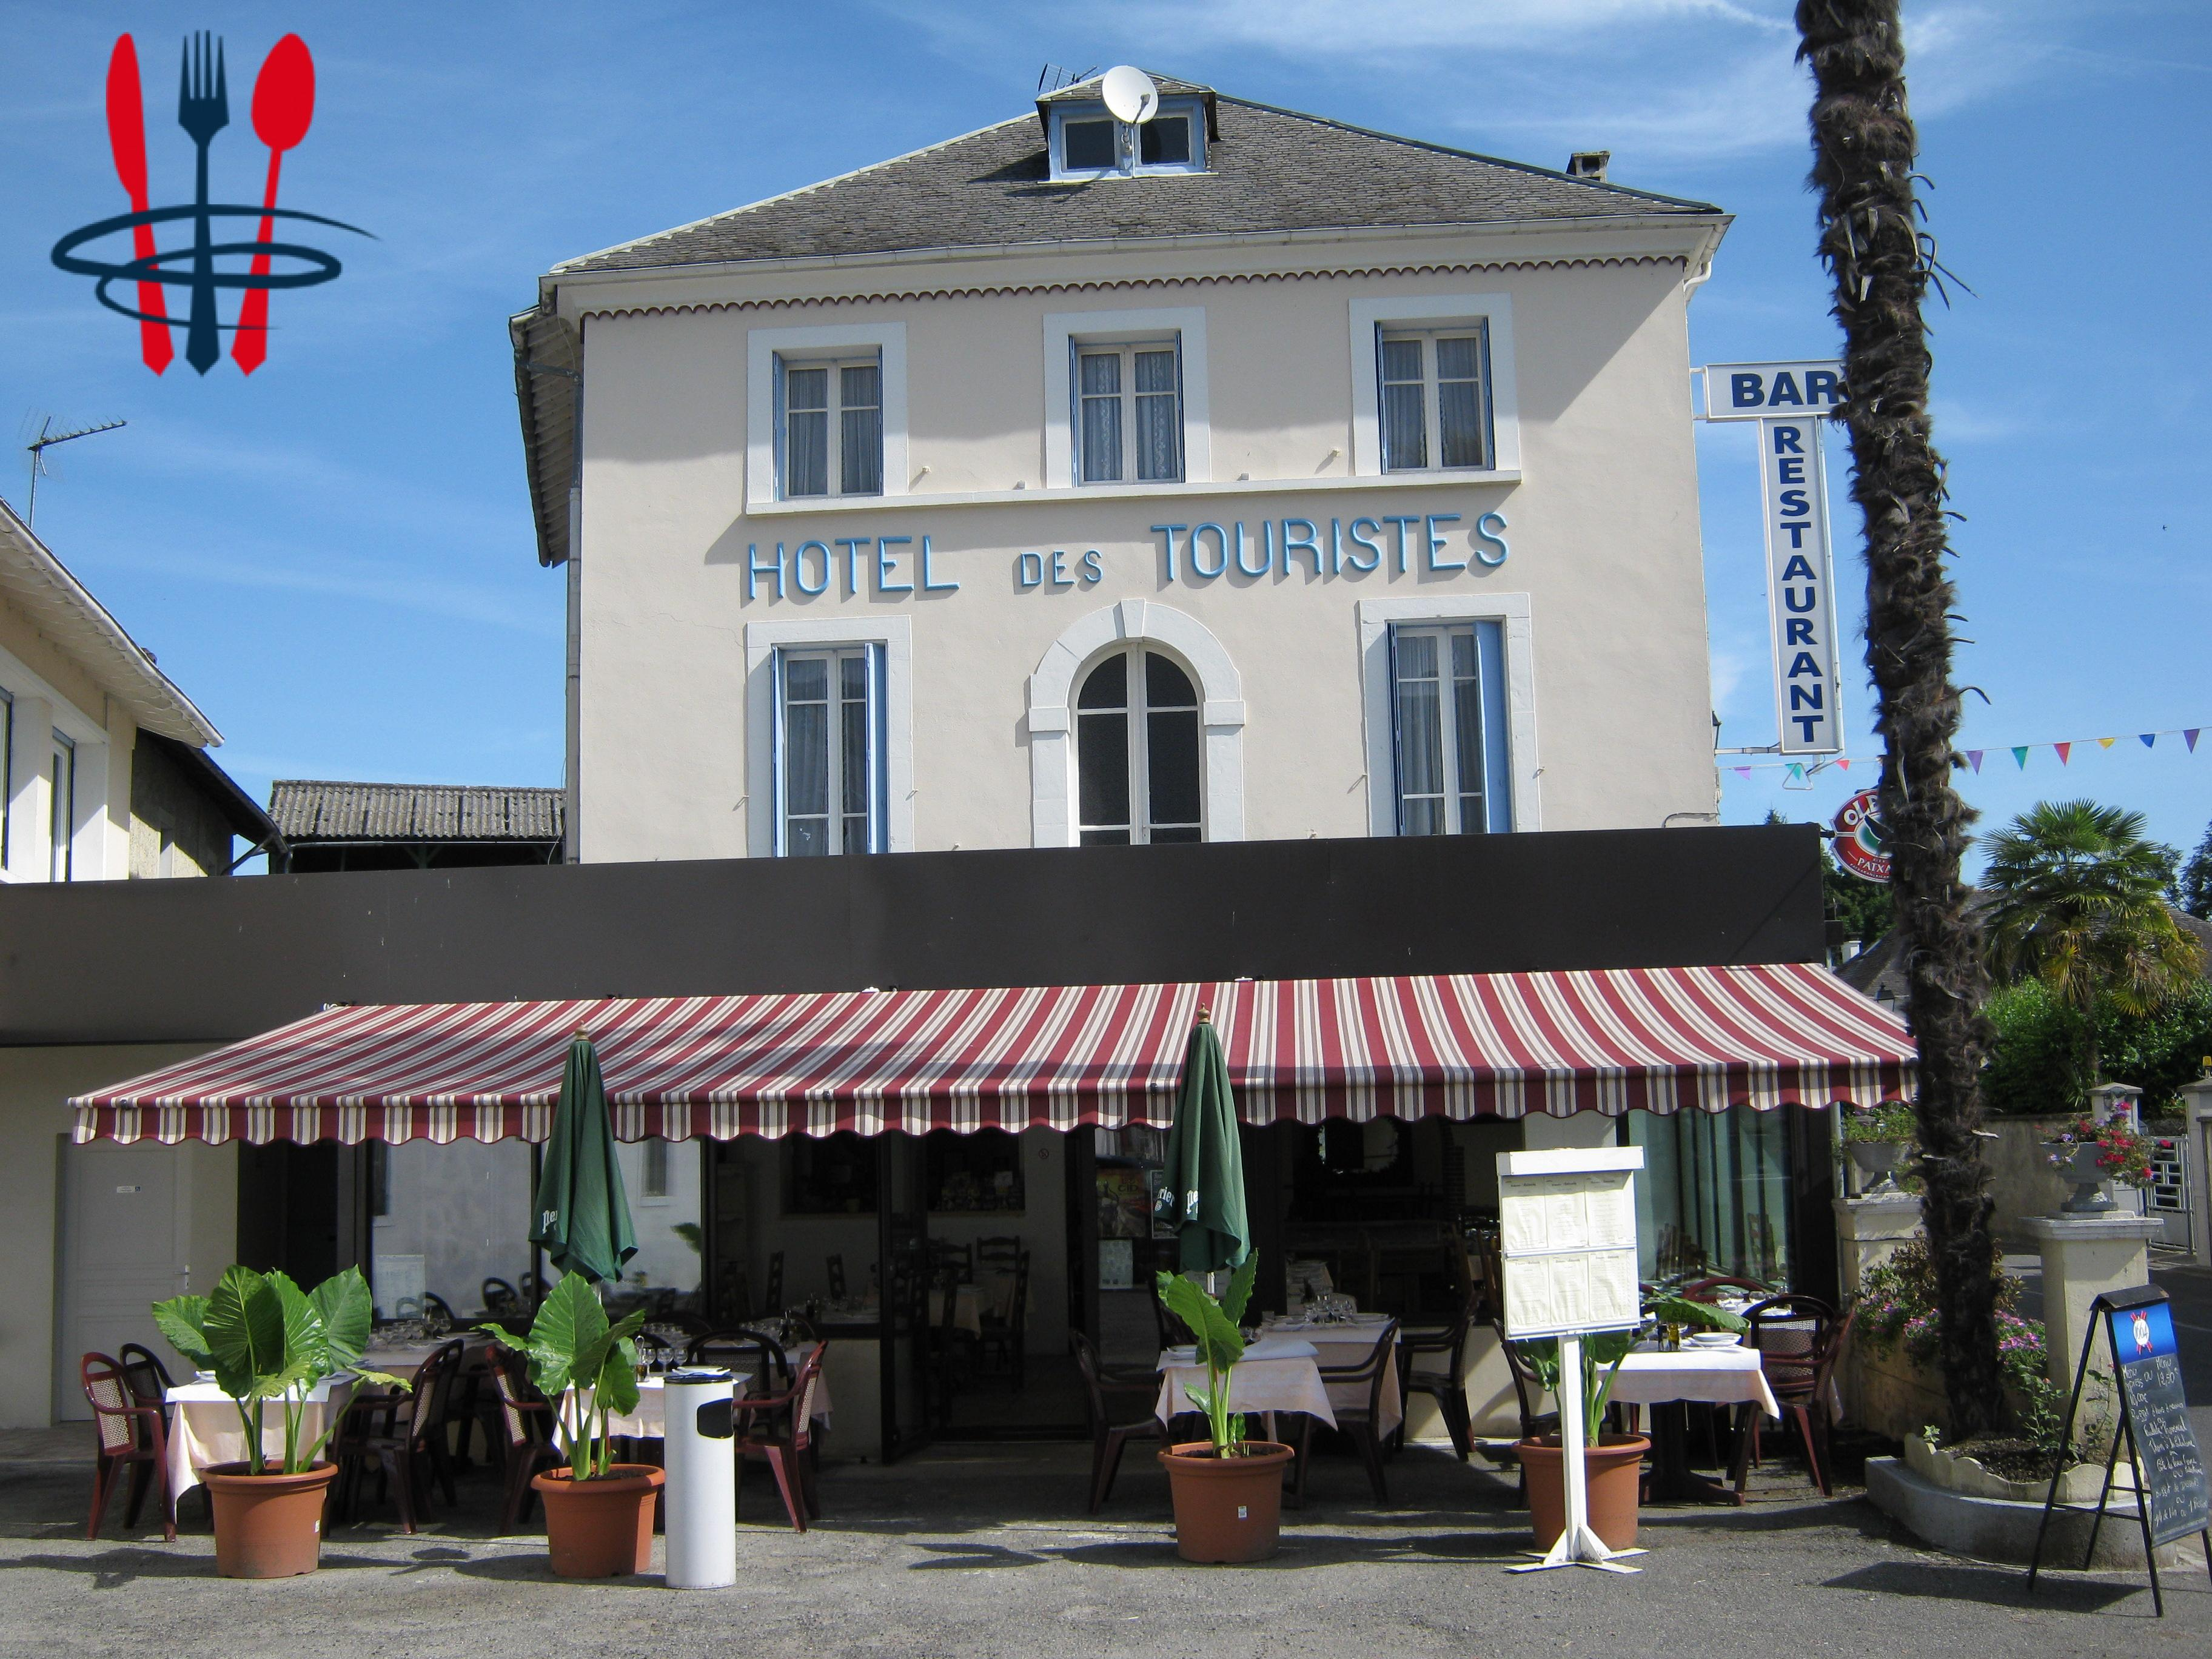 BAR-HOTEL-RESTAURANT